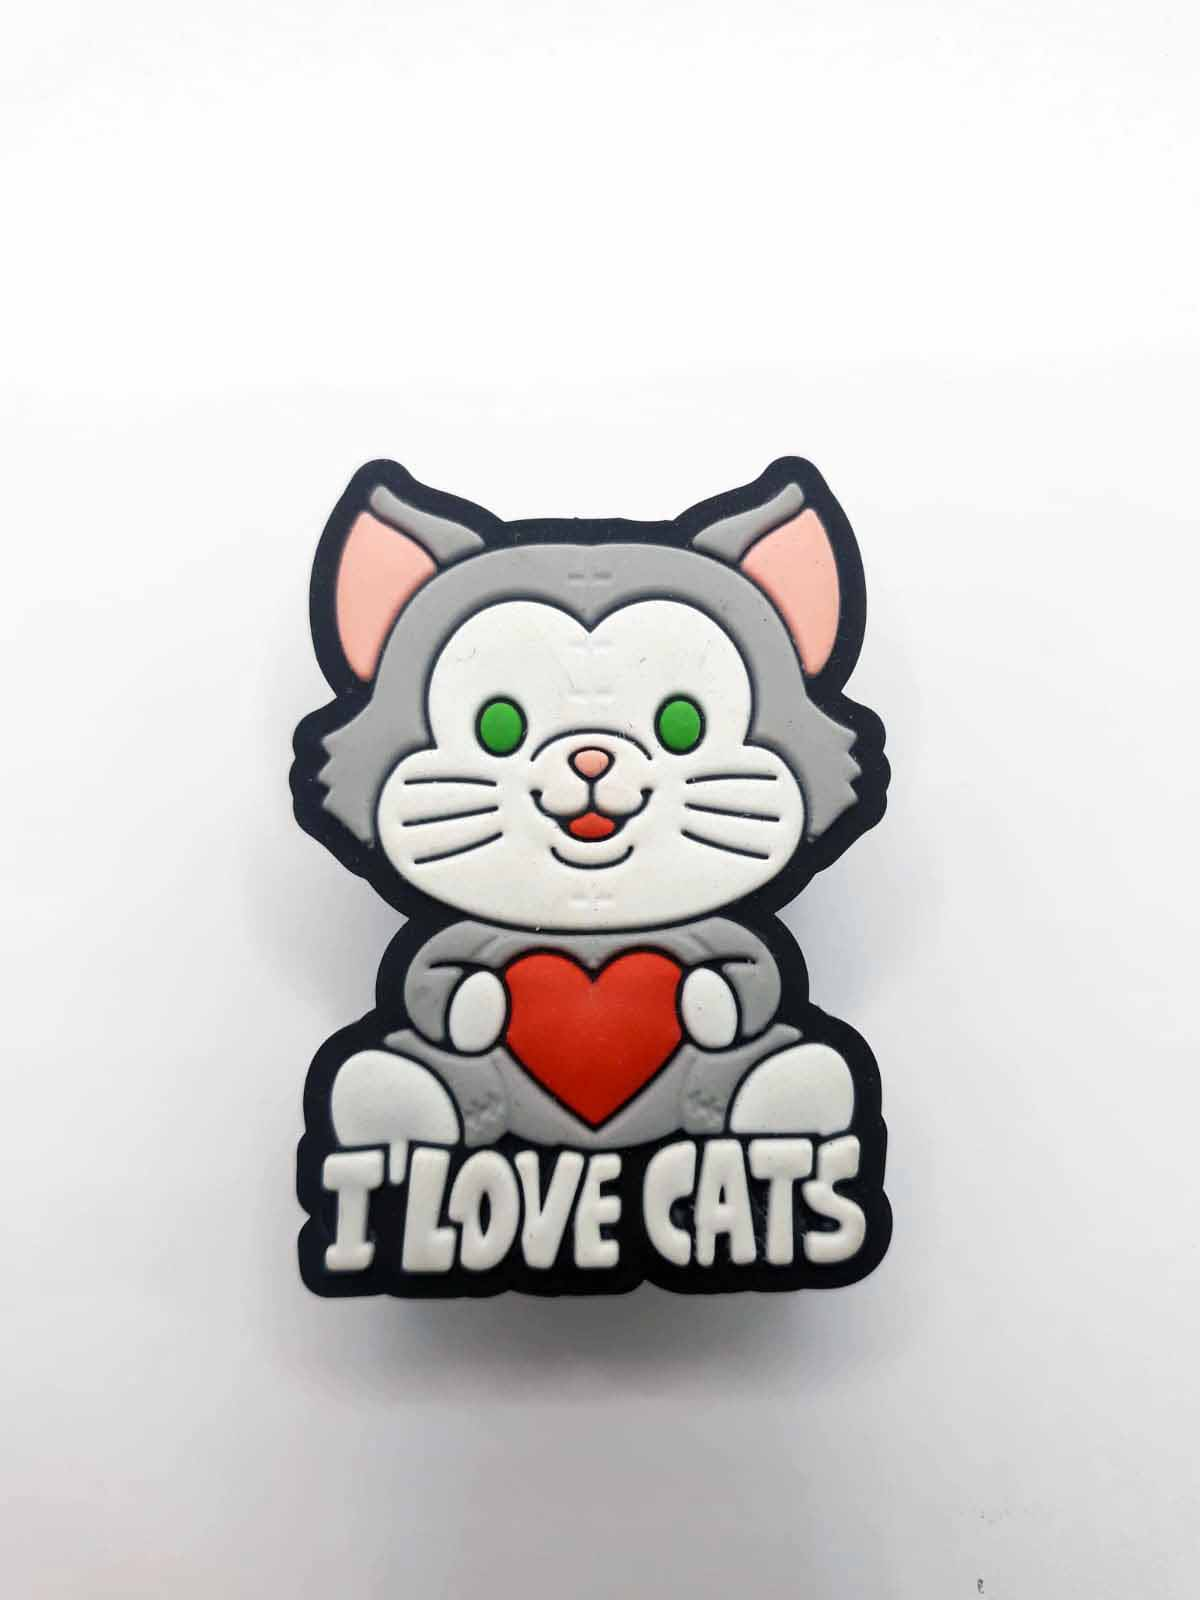 Puxador gaveta infantil emborrachado I LOVE CATS